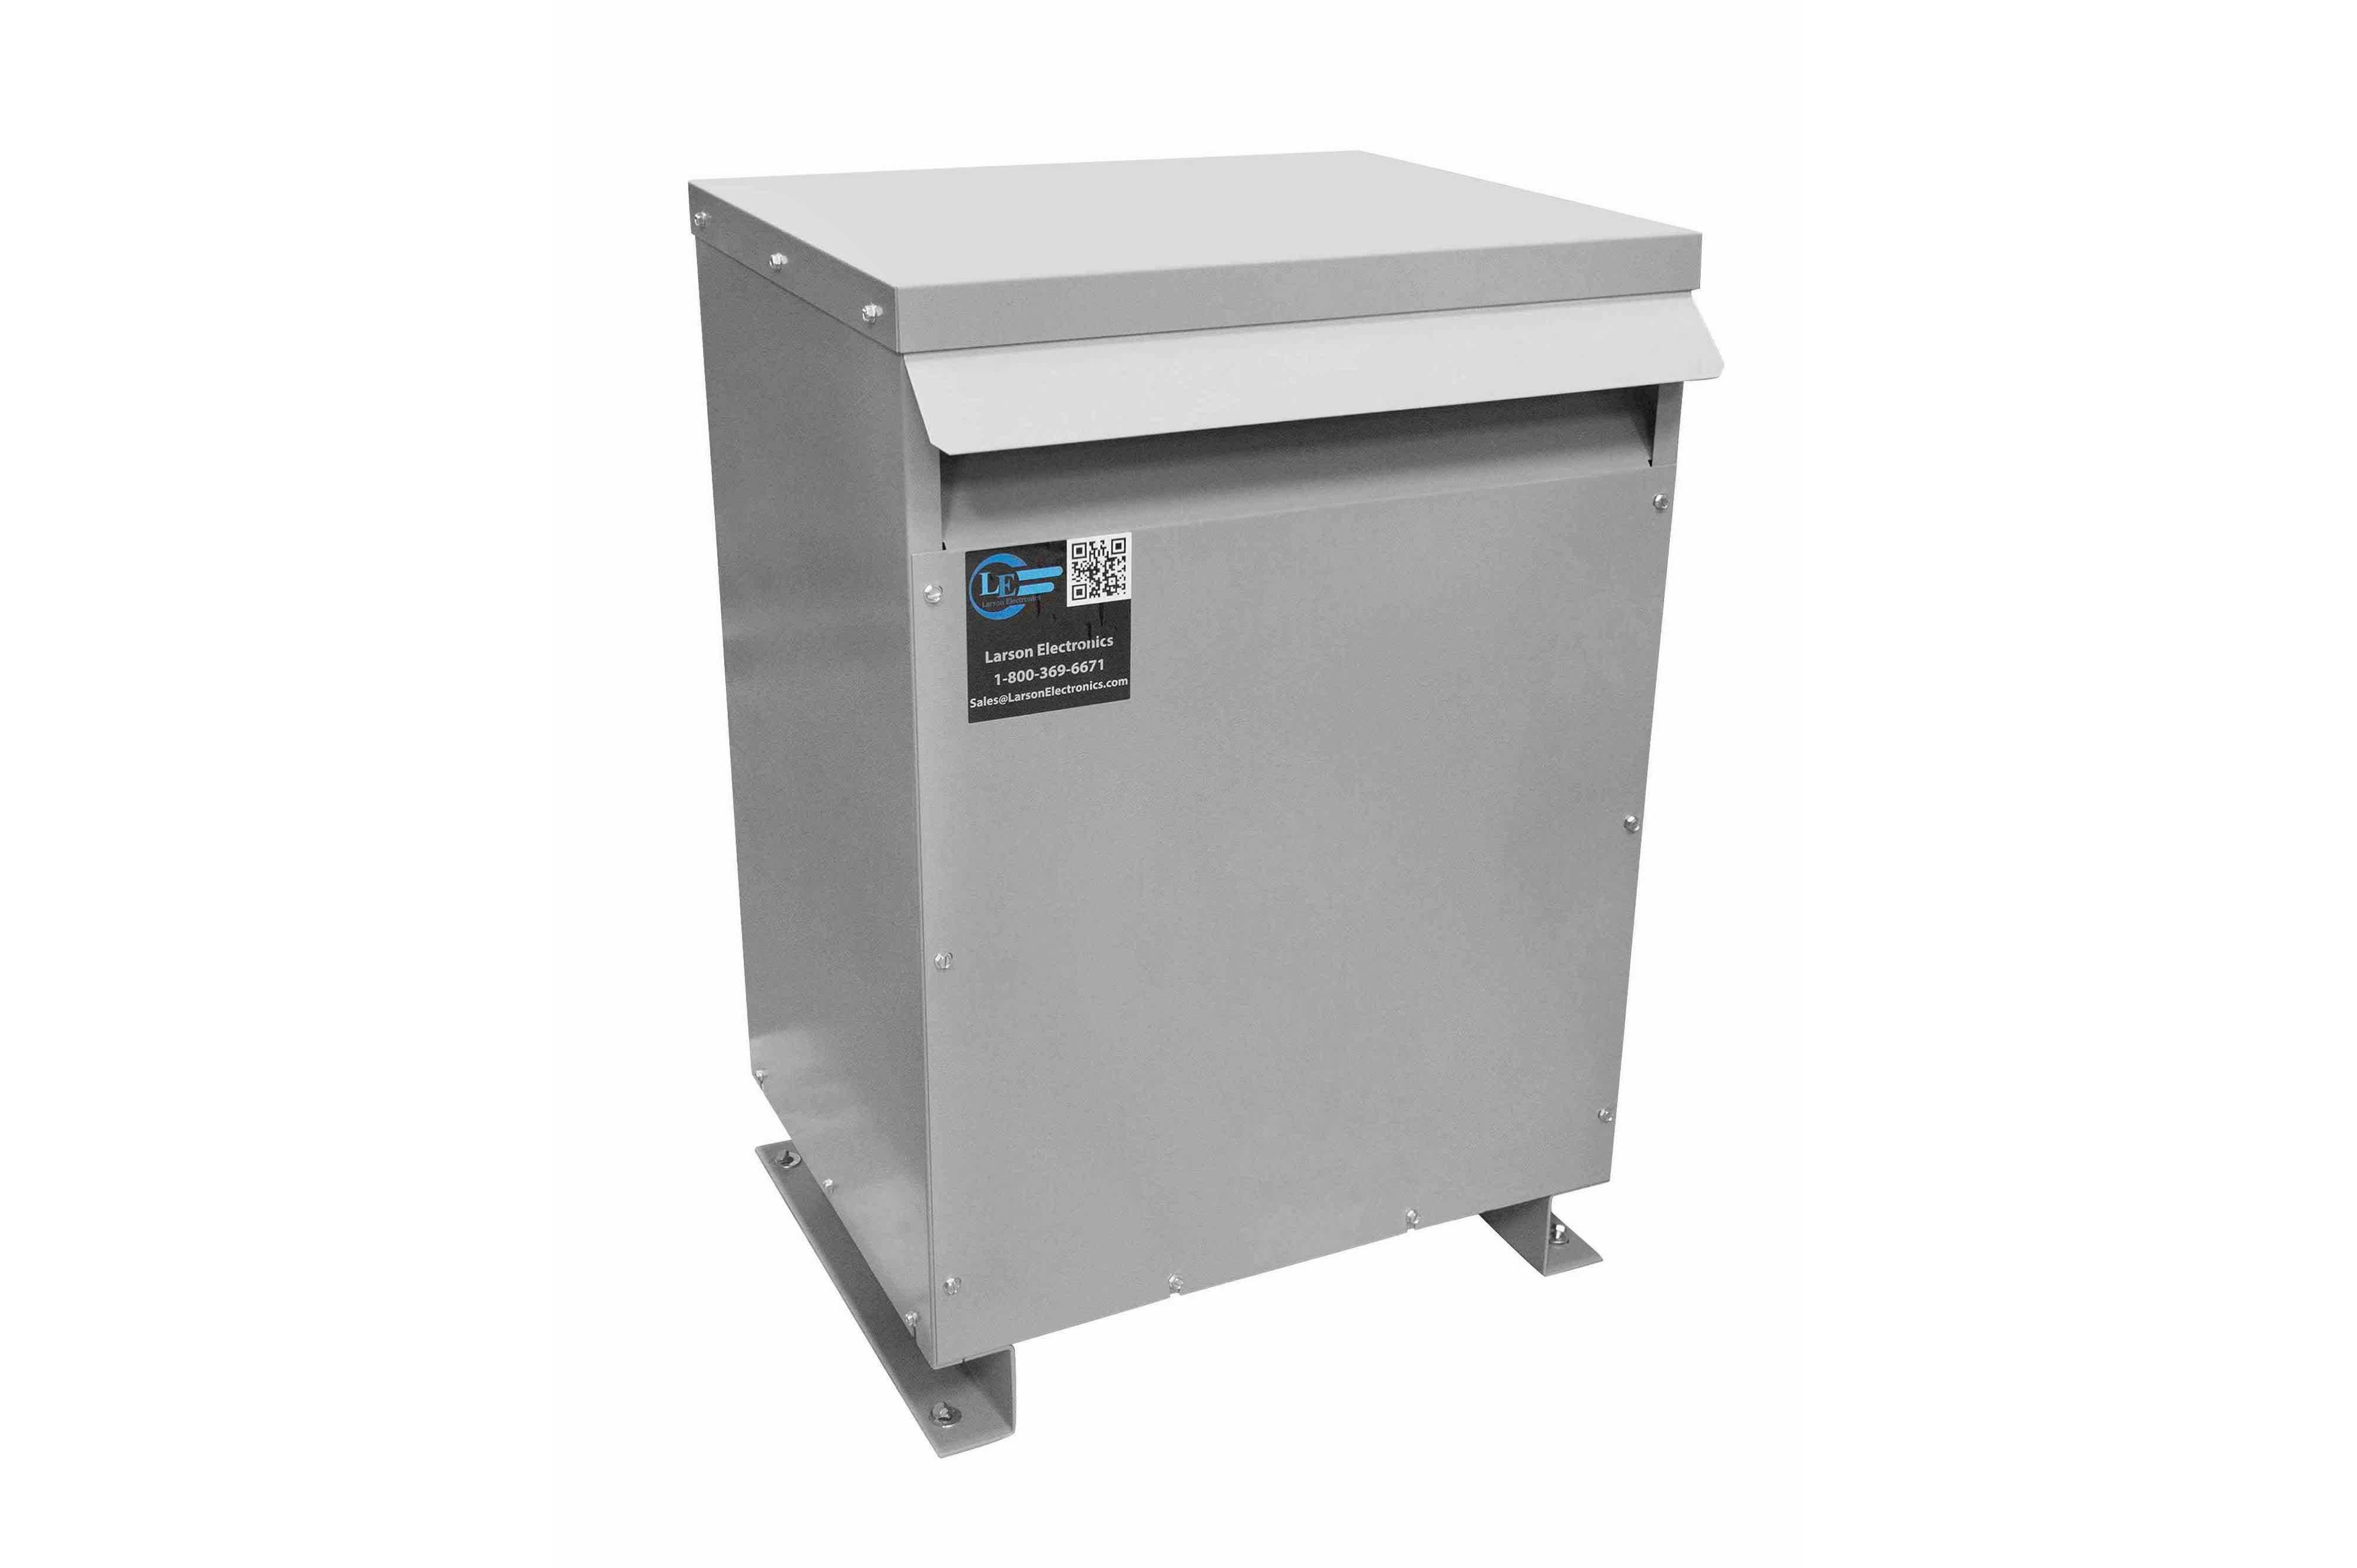 150 kVA 3PH Isolation Transformer, 220V Wye Primary, 208Y/120 Wye-N Secondary, N3R, Ventilated, 60 Hz